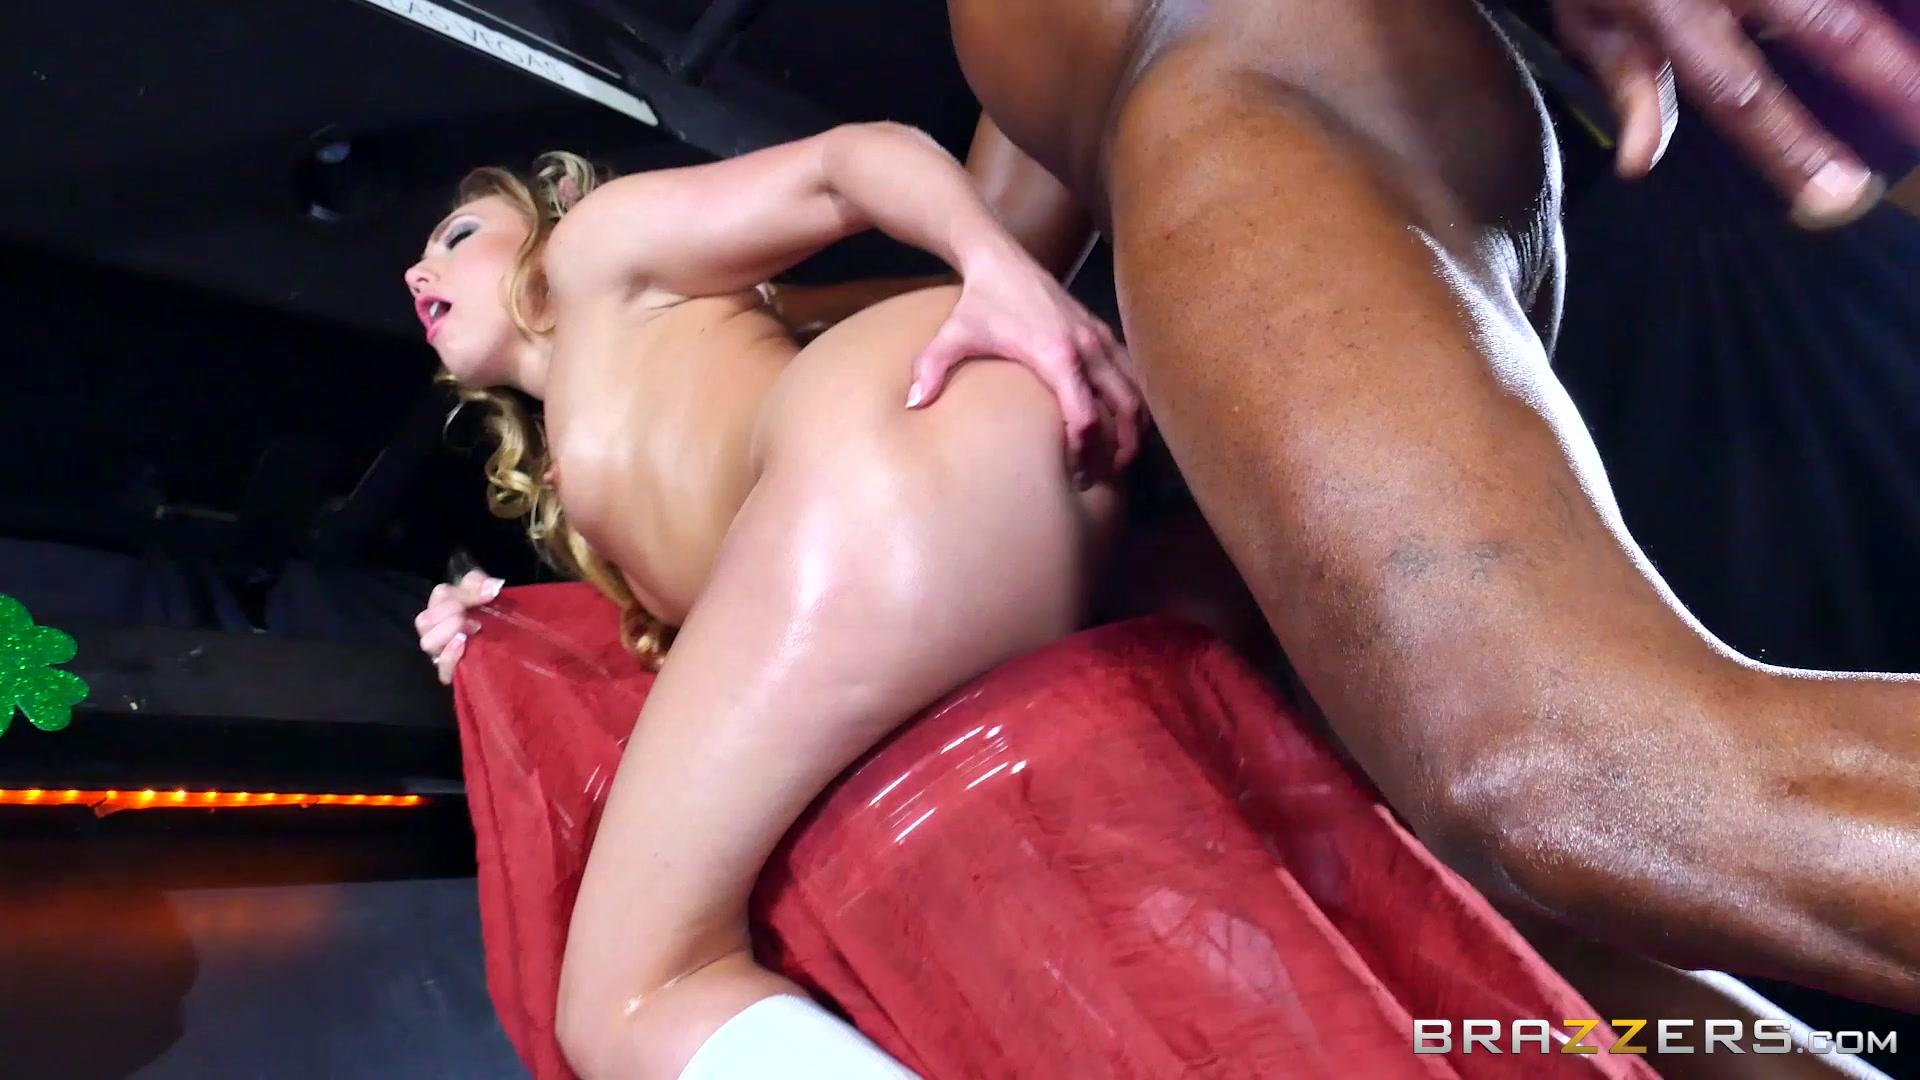 Purple Passion, Je TAime, & Tanya Foxx - Porn Video